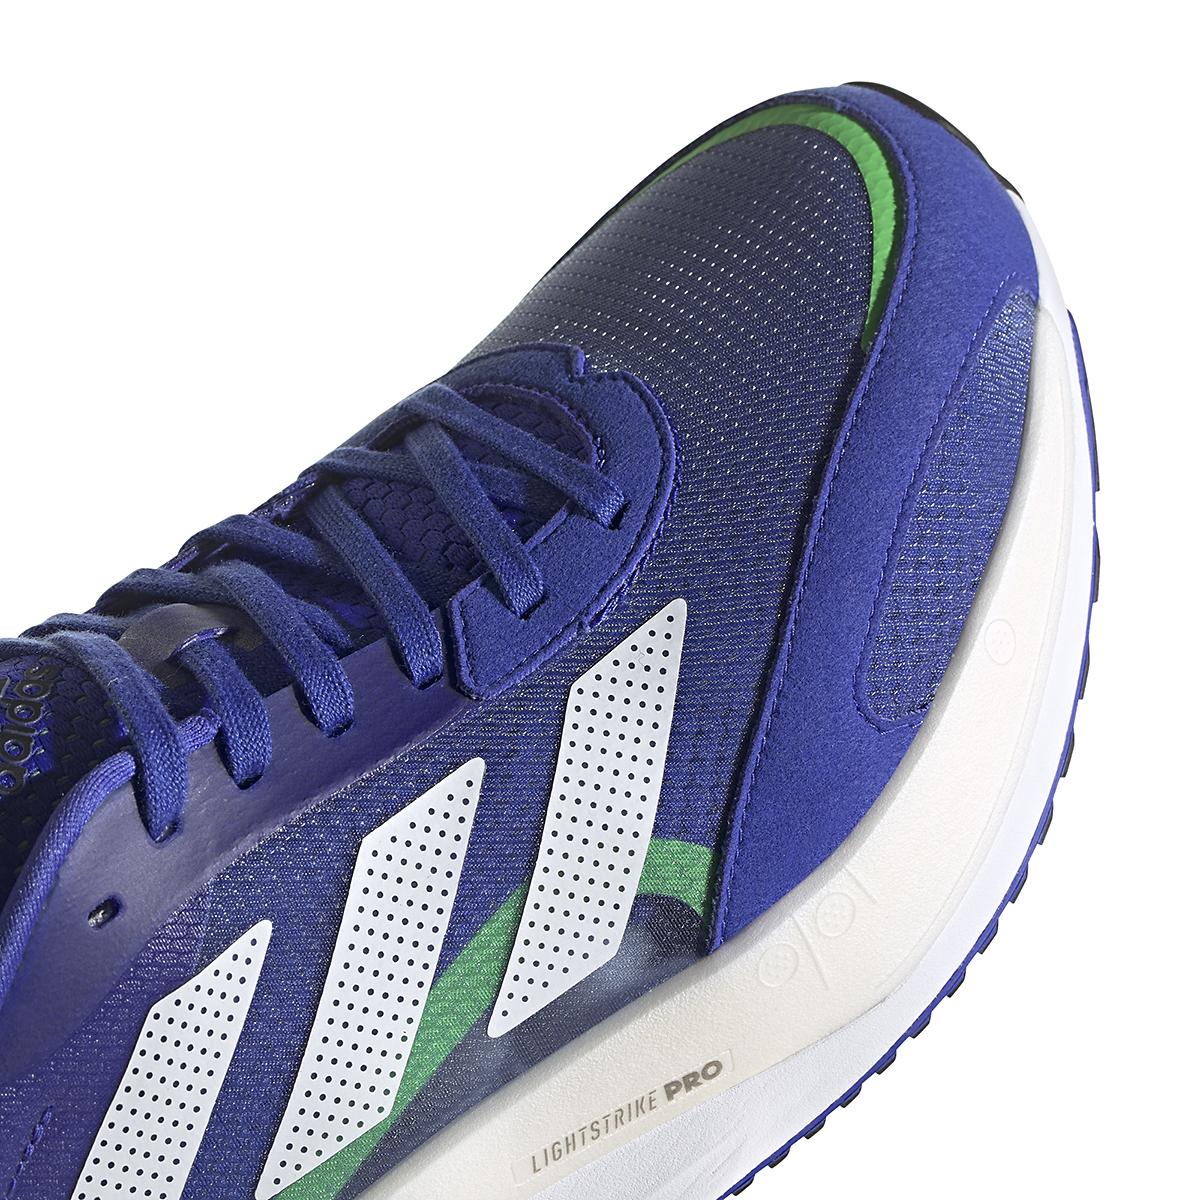 Men's Adidas Adizero Boston 10 Running Shoe - Color: Sonic Ink/White/Screaming Green - Size: 6.5 - Width: Regular, Sonic Ink/White/Screaming Green, large, image 4